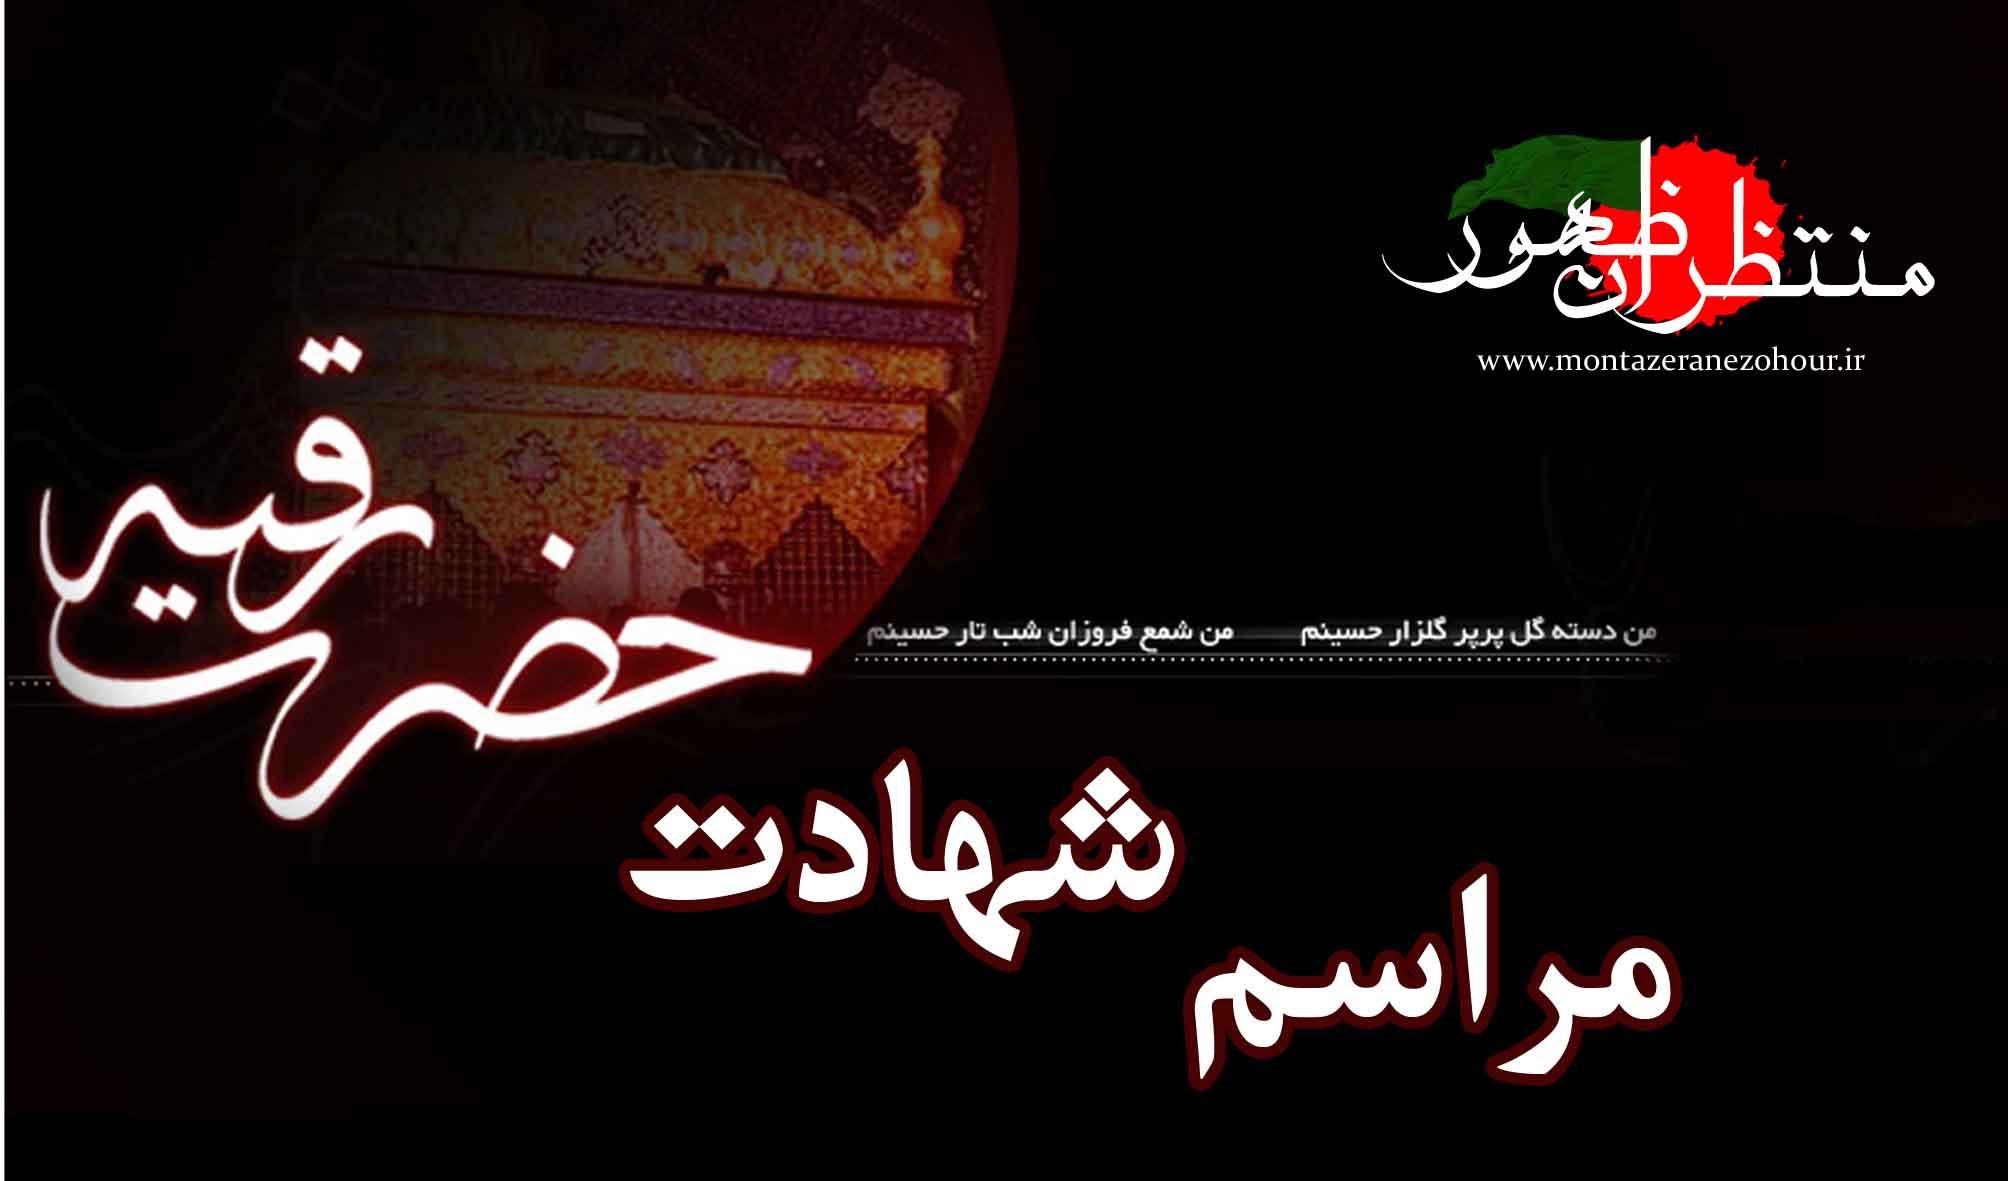 http://borooj.persiangig.com/audio/sh.hazrate%20roghayeh/hazrat-roghaye%20.jpg